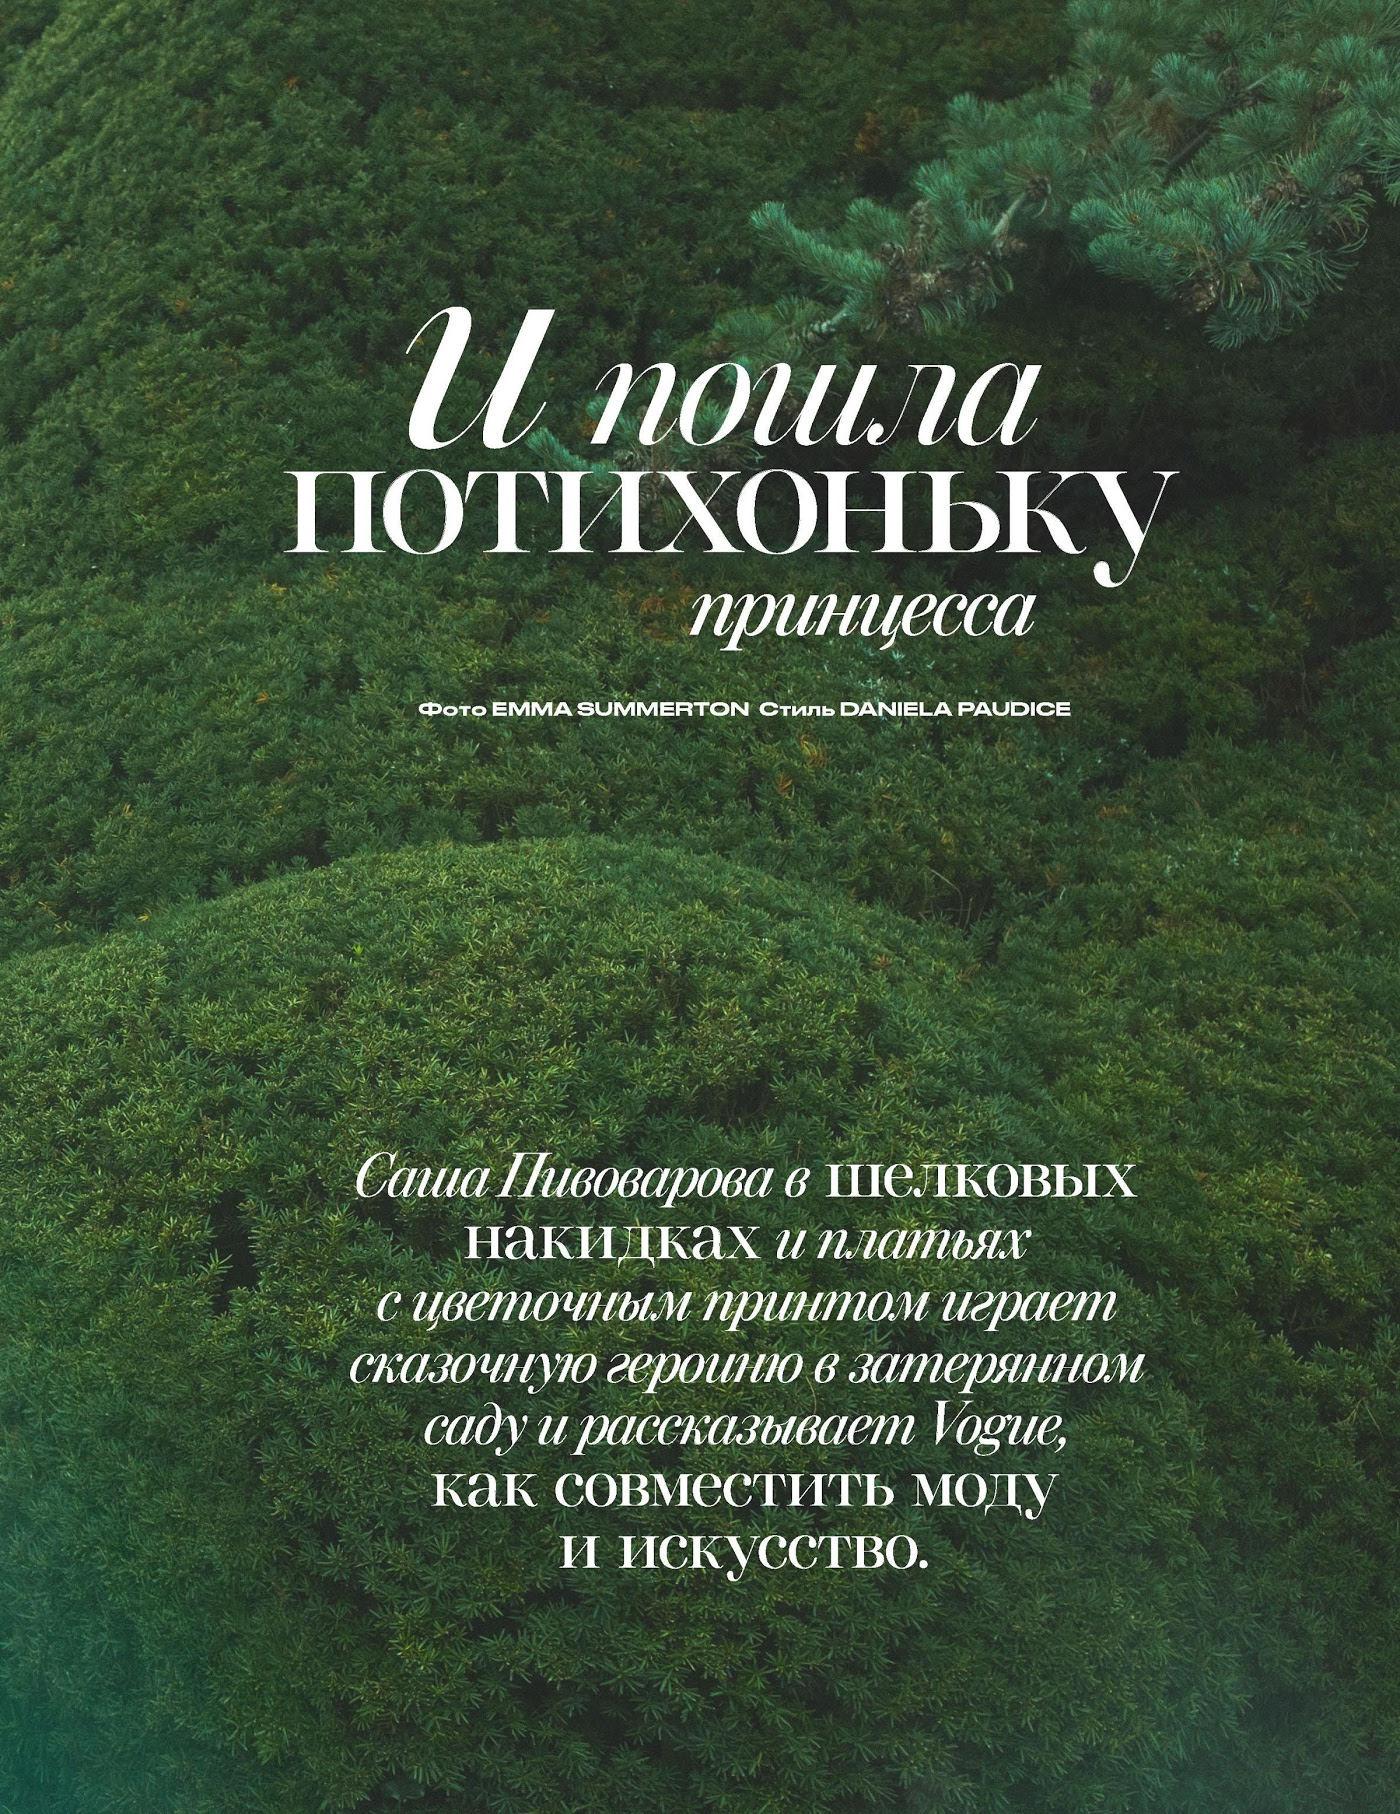 Sasha Pivovarova by Emma Summerton Vogue Russia November 2018 (6).jpg